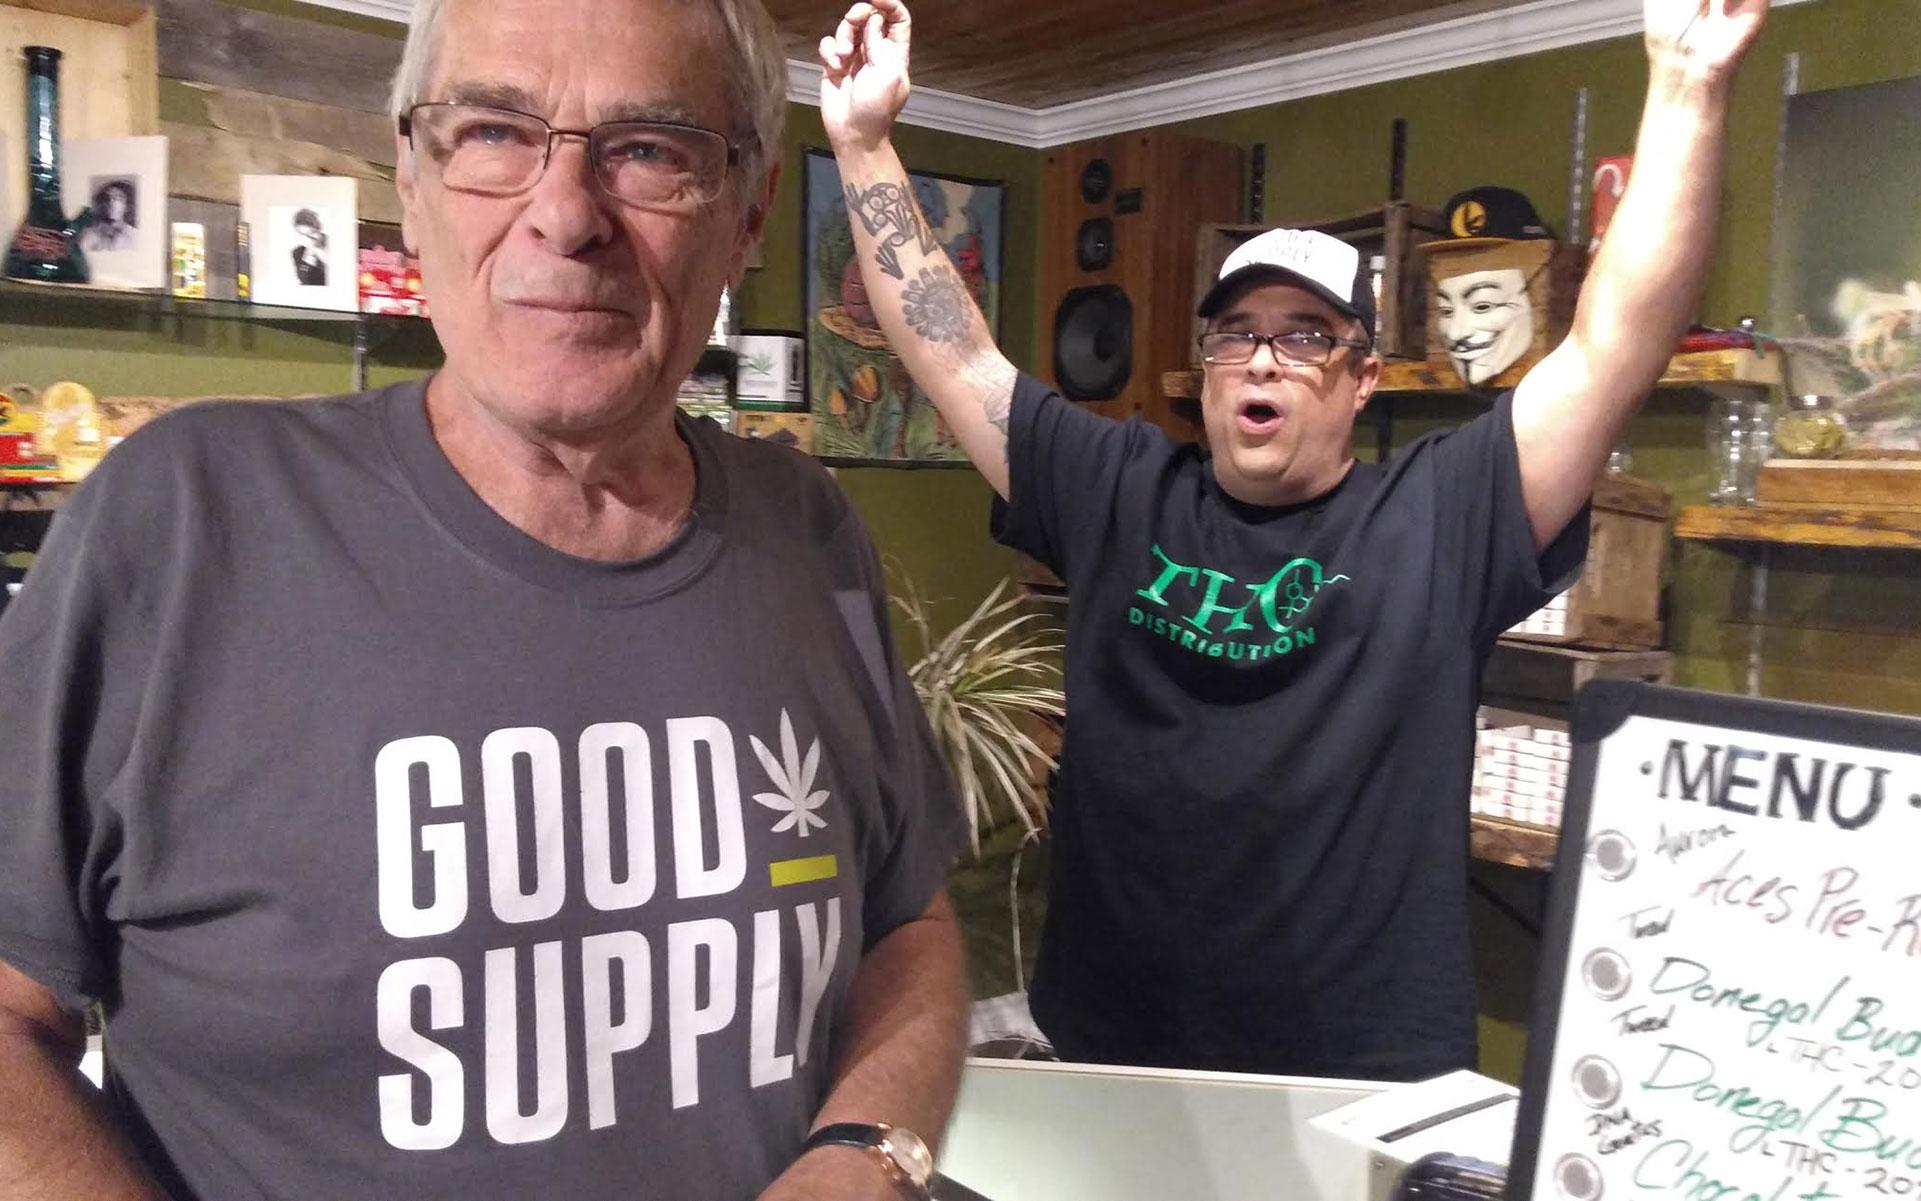 newfoundland legal cannabis st. johns